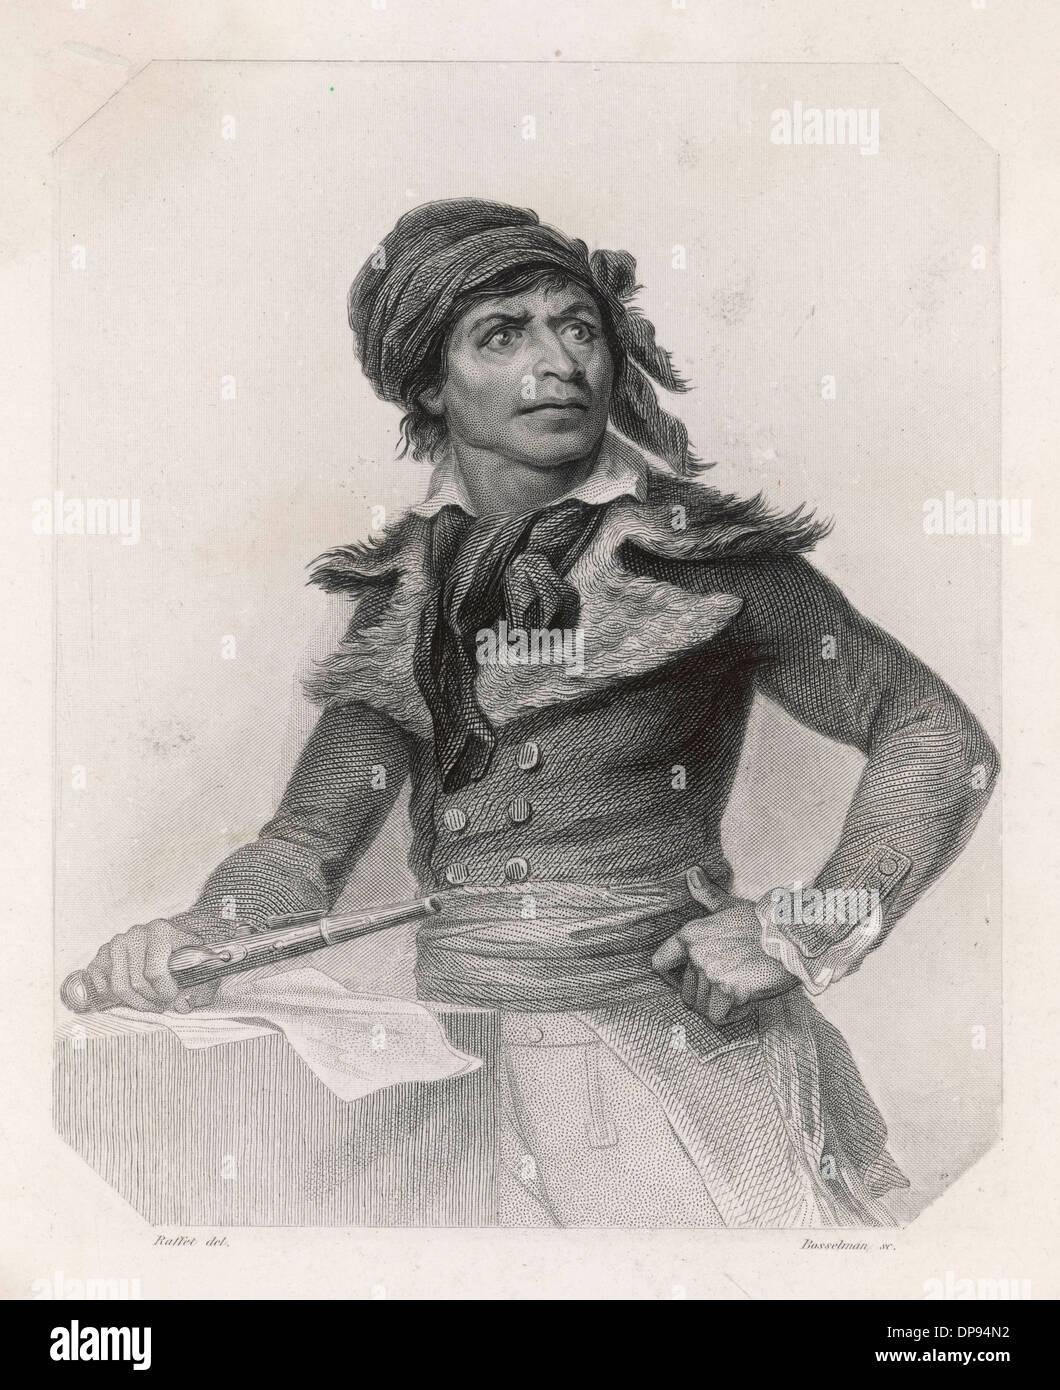 Jean-Paul Marat, French revolutionary - Stock Image